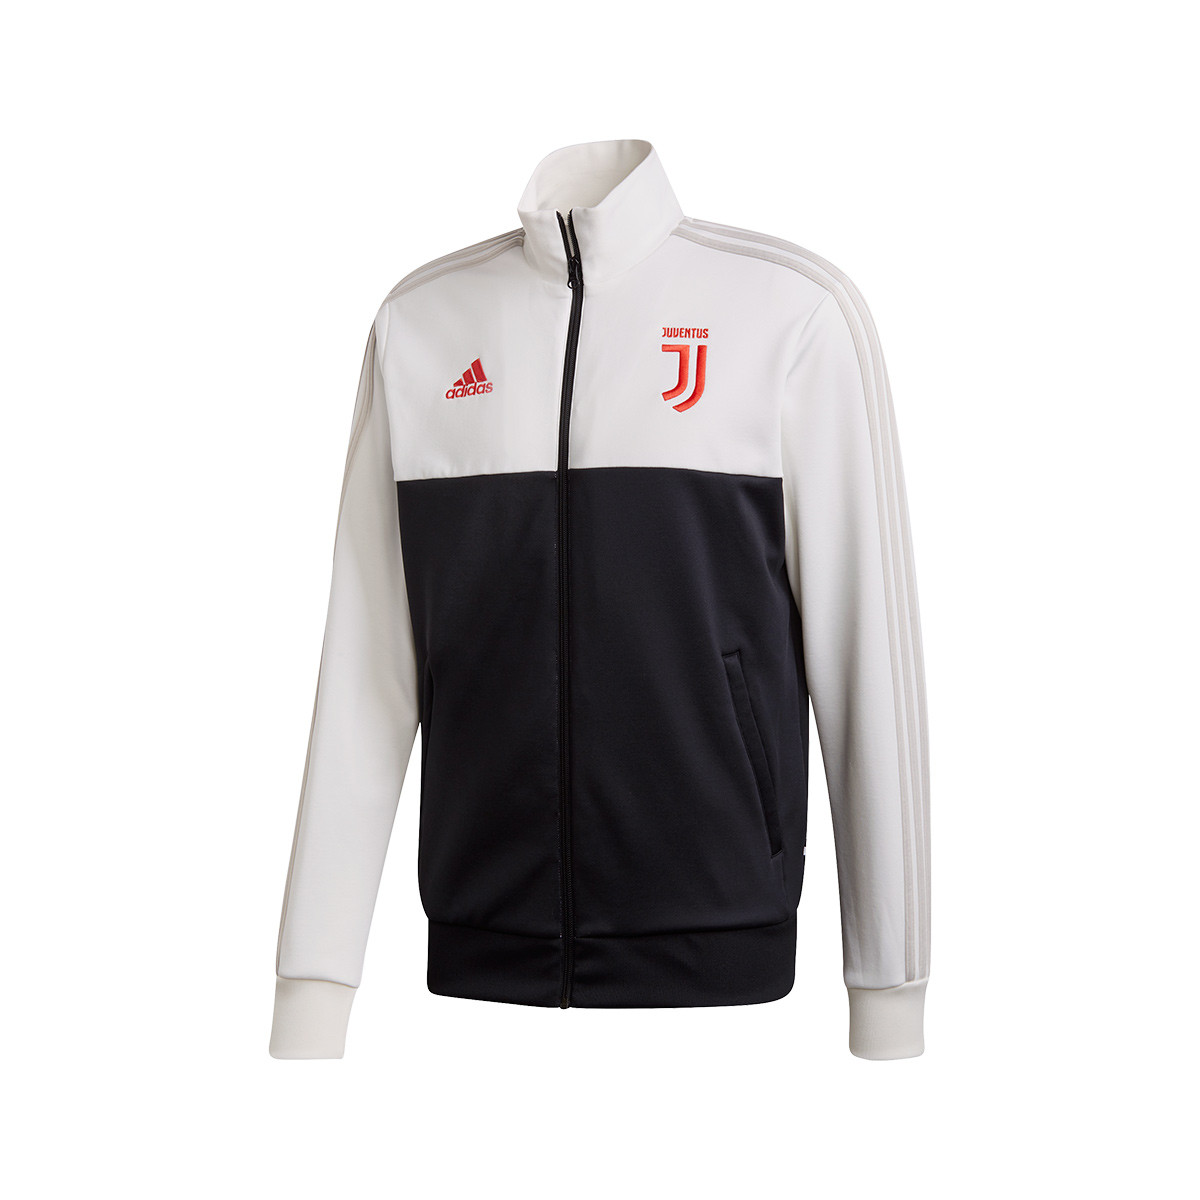 Veste adidas Juventus 3S 2019 2020